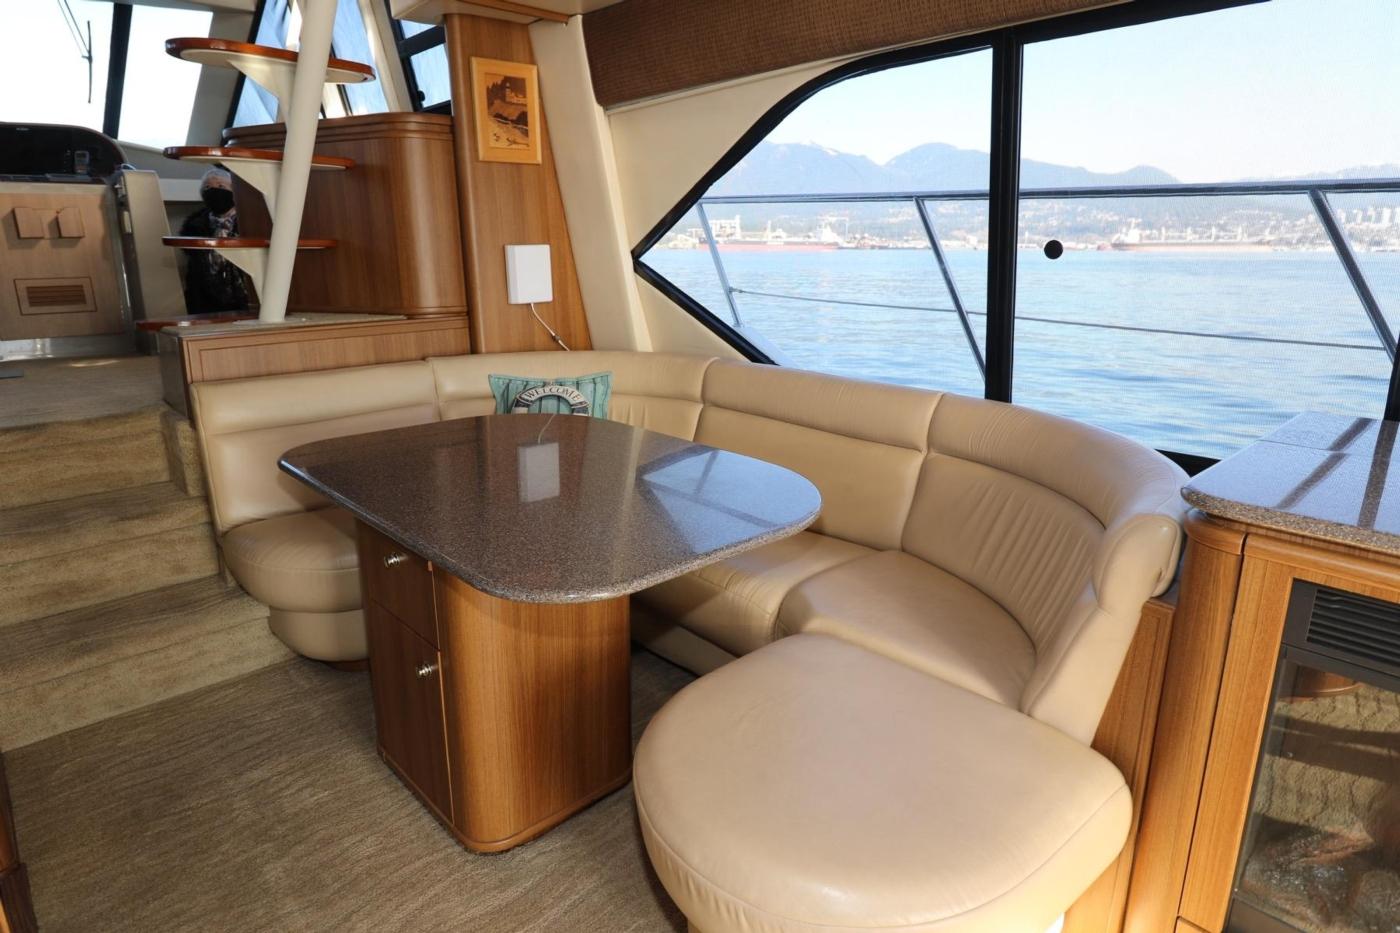 1999 Bayliner 5788 Pilot House Motoryacht, Dinette and Table